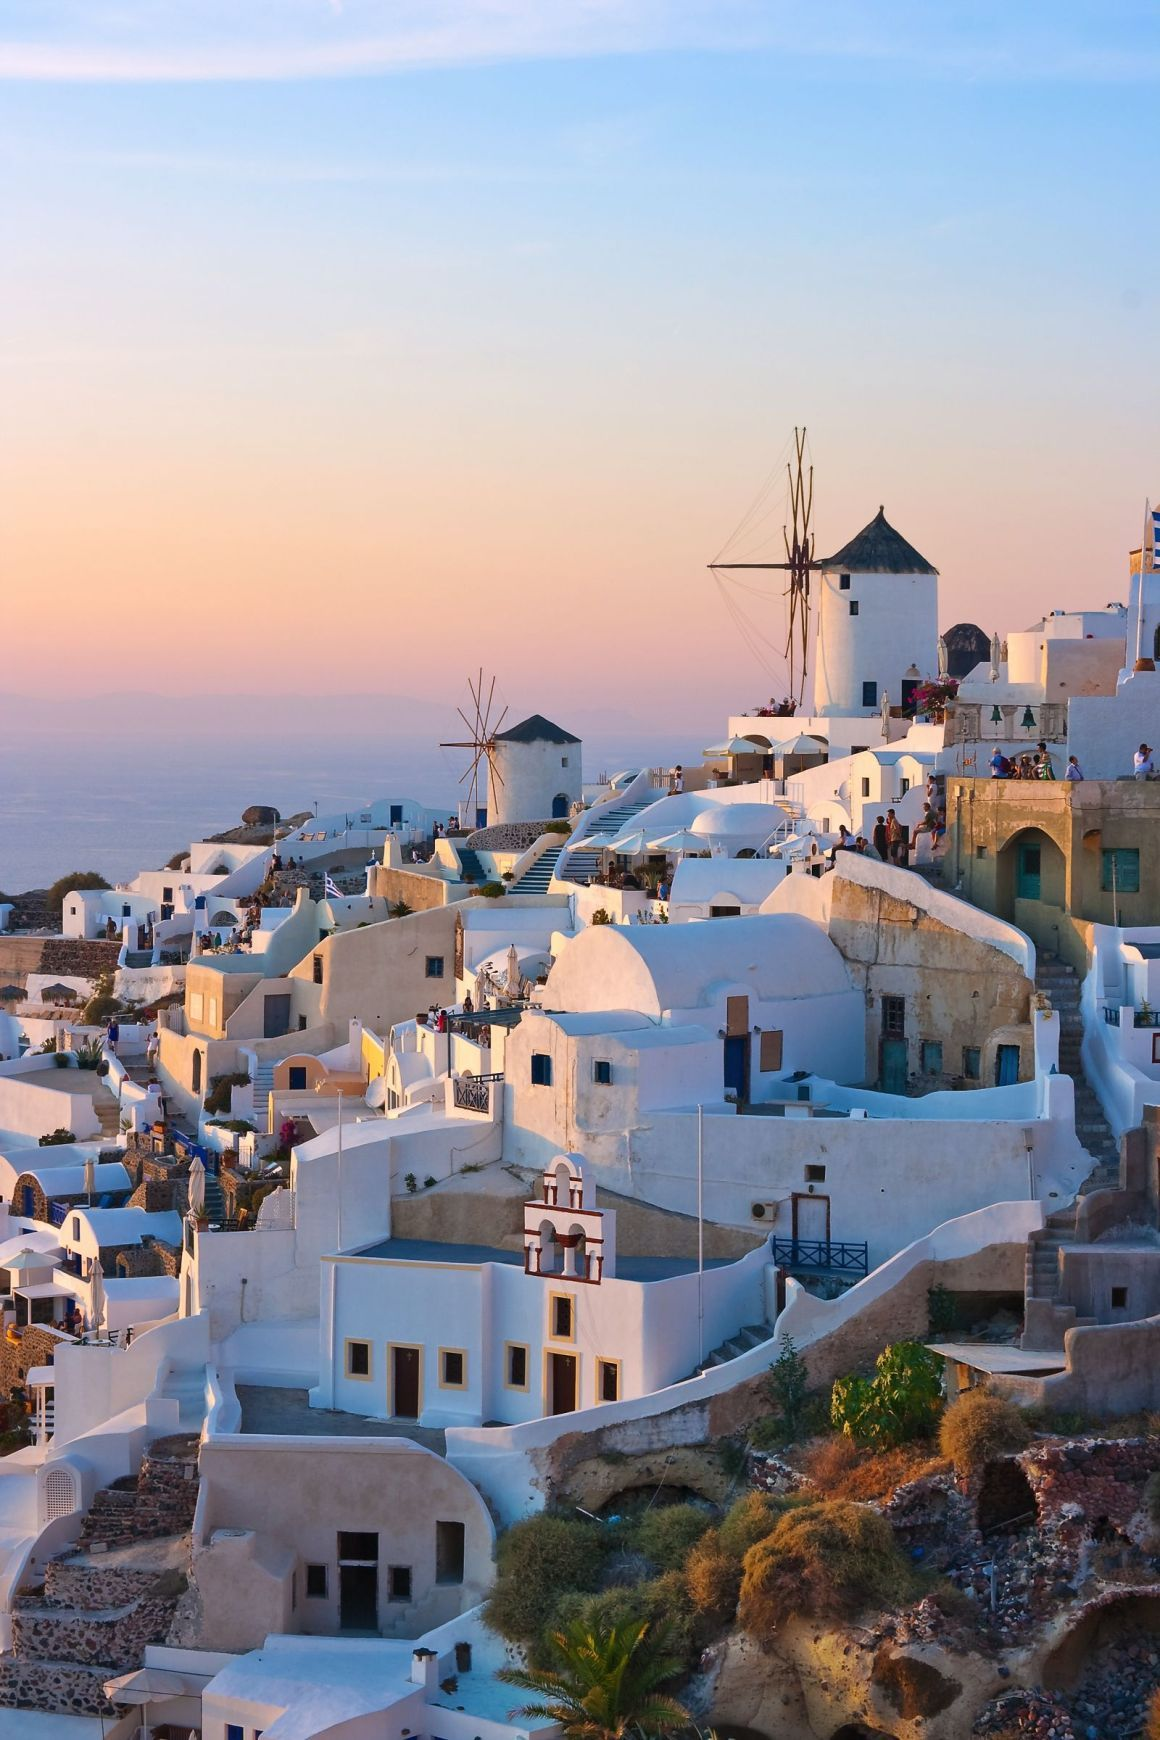 12 Best Things To Do In Santorini Greece Greek Islands To Visit Best Greek Islands Greece Islands